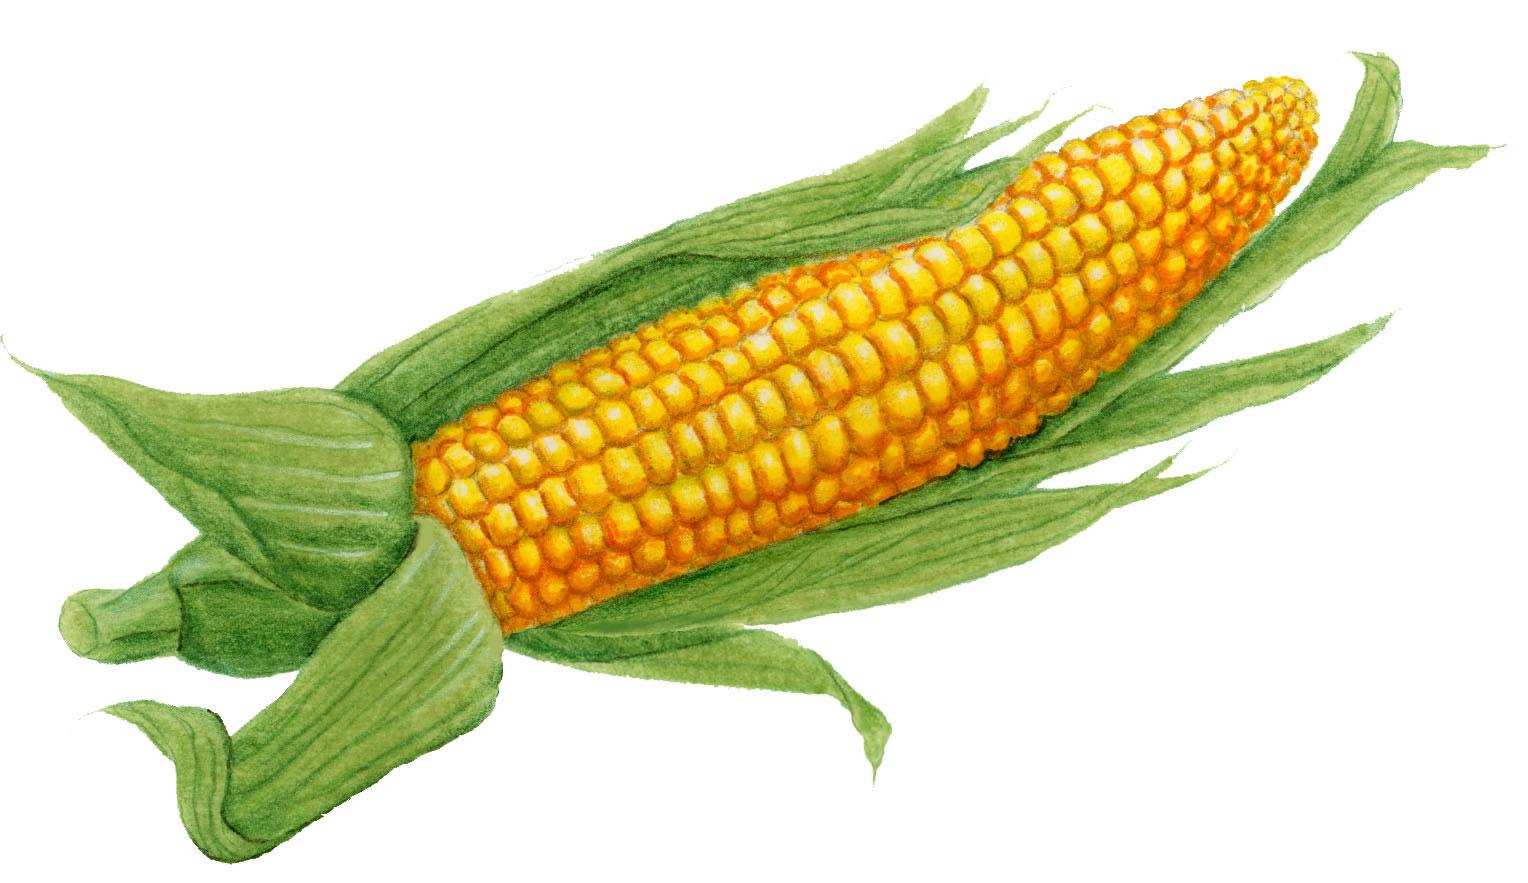 Clipart ear of corn jpg library stock Ear of corn clipart 1 » Clipart Station jpg library stock